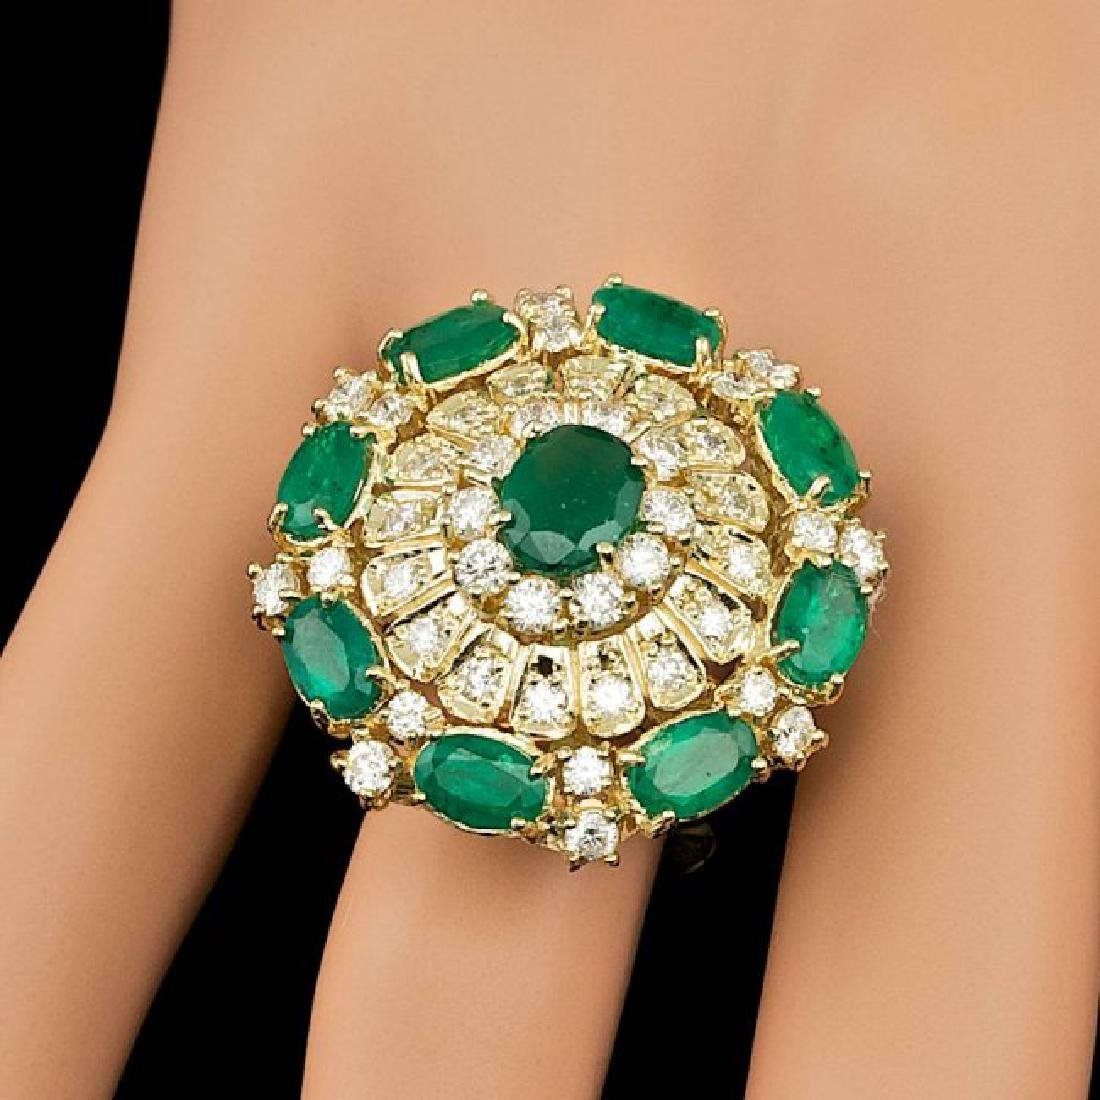 14k Gold 5.00ct Emerald 2.00ct Diamond Ring - 7